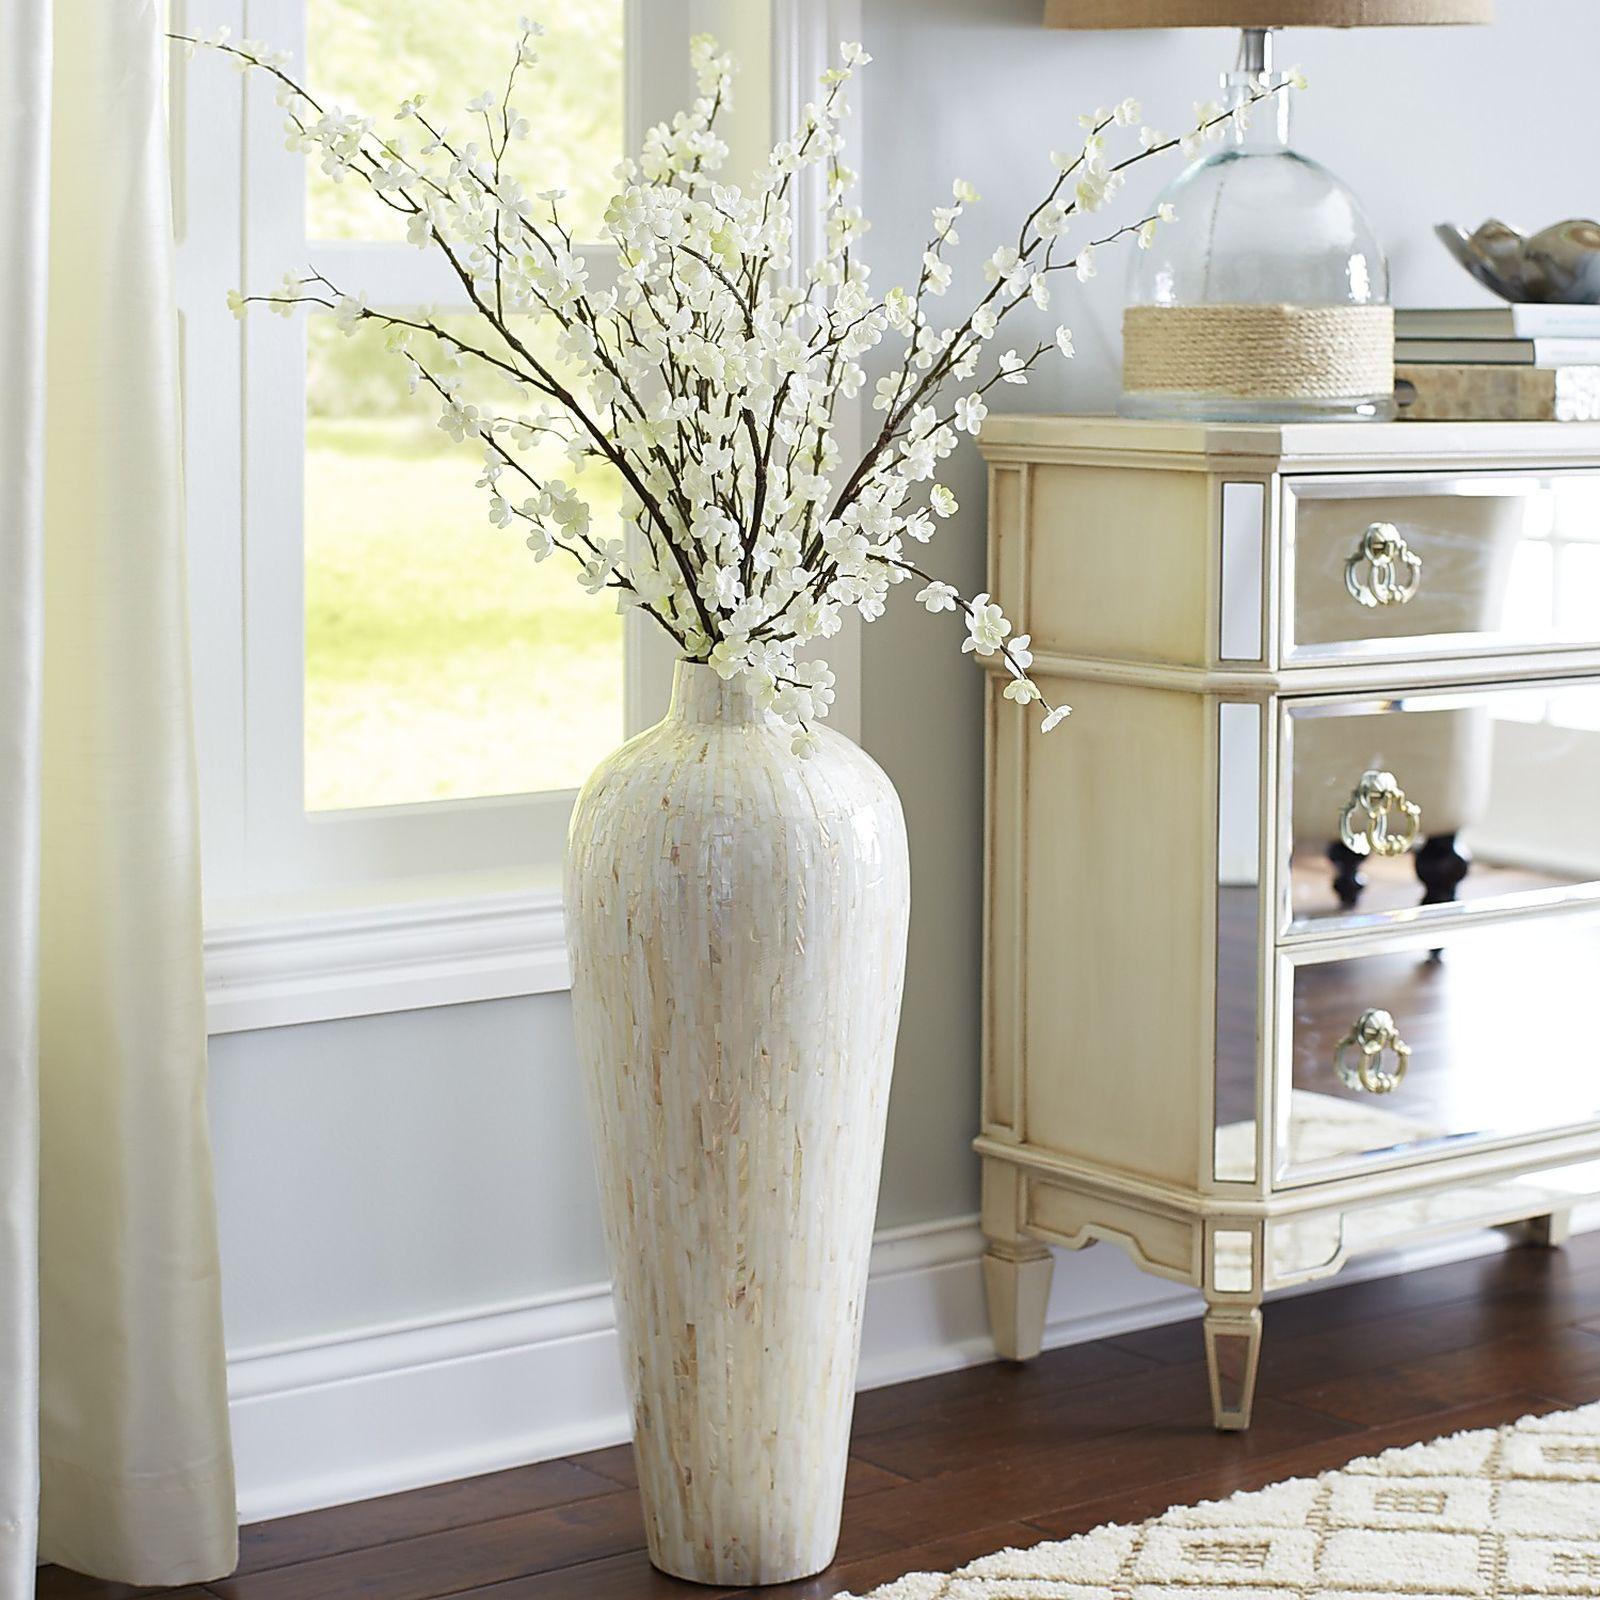 Null Floor Vase Decor Home Decor Vases Floor Vase